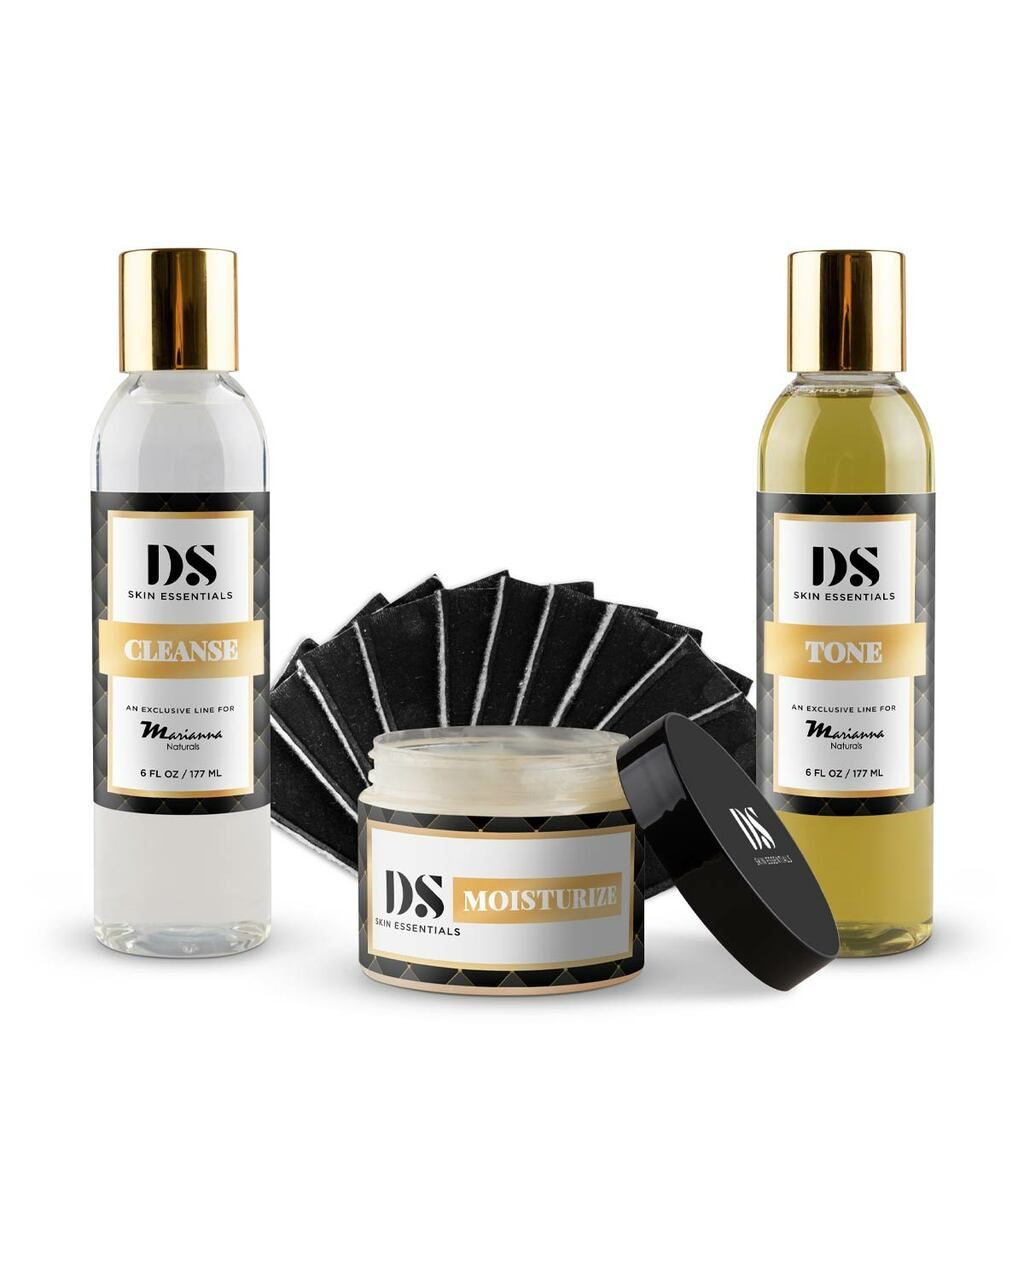 DS Skin Essentials 3pc Set - Primary Thumbnail